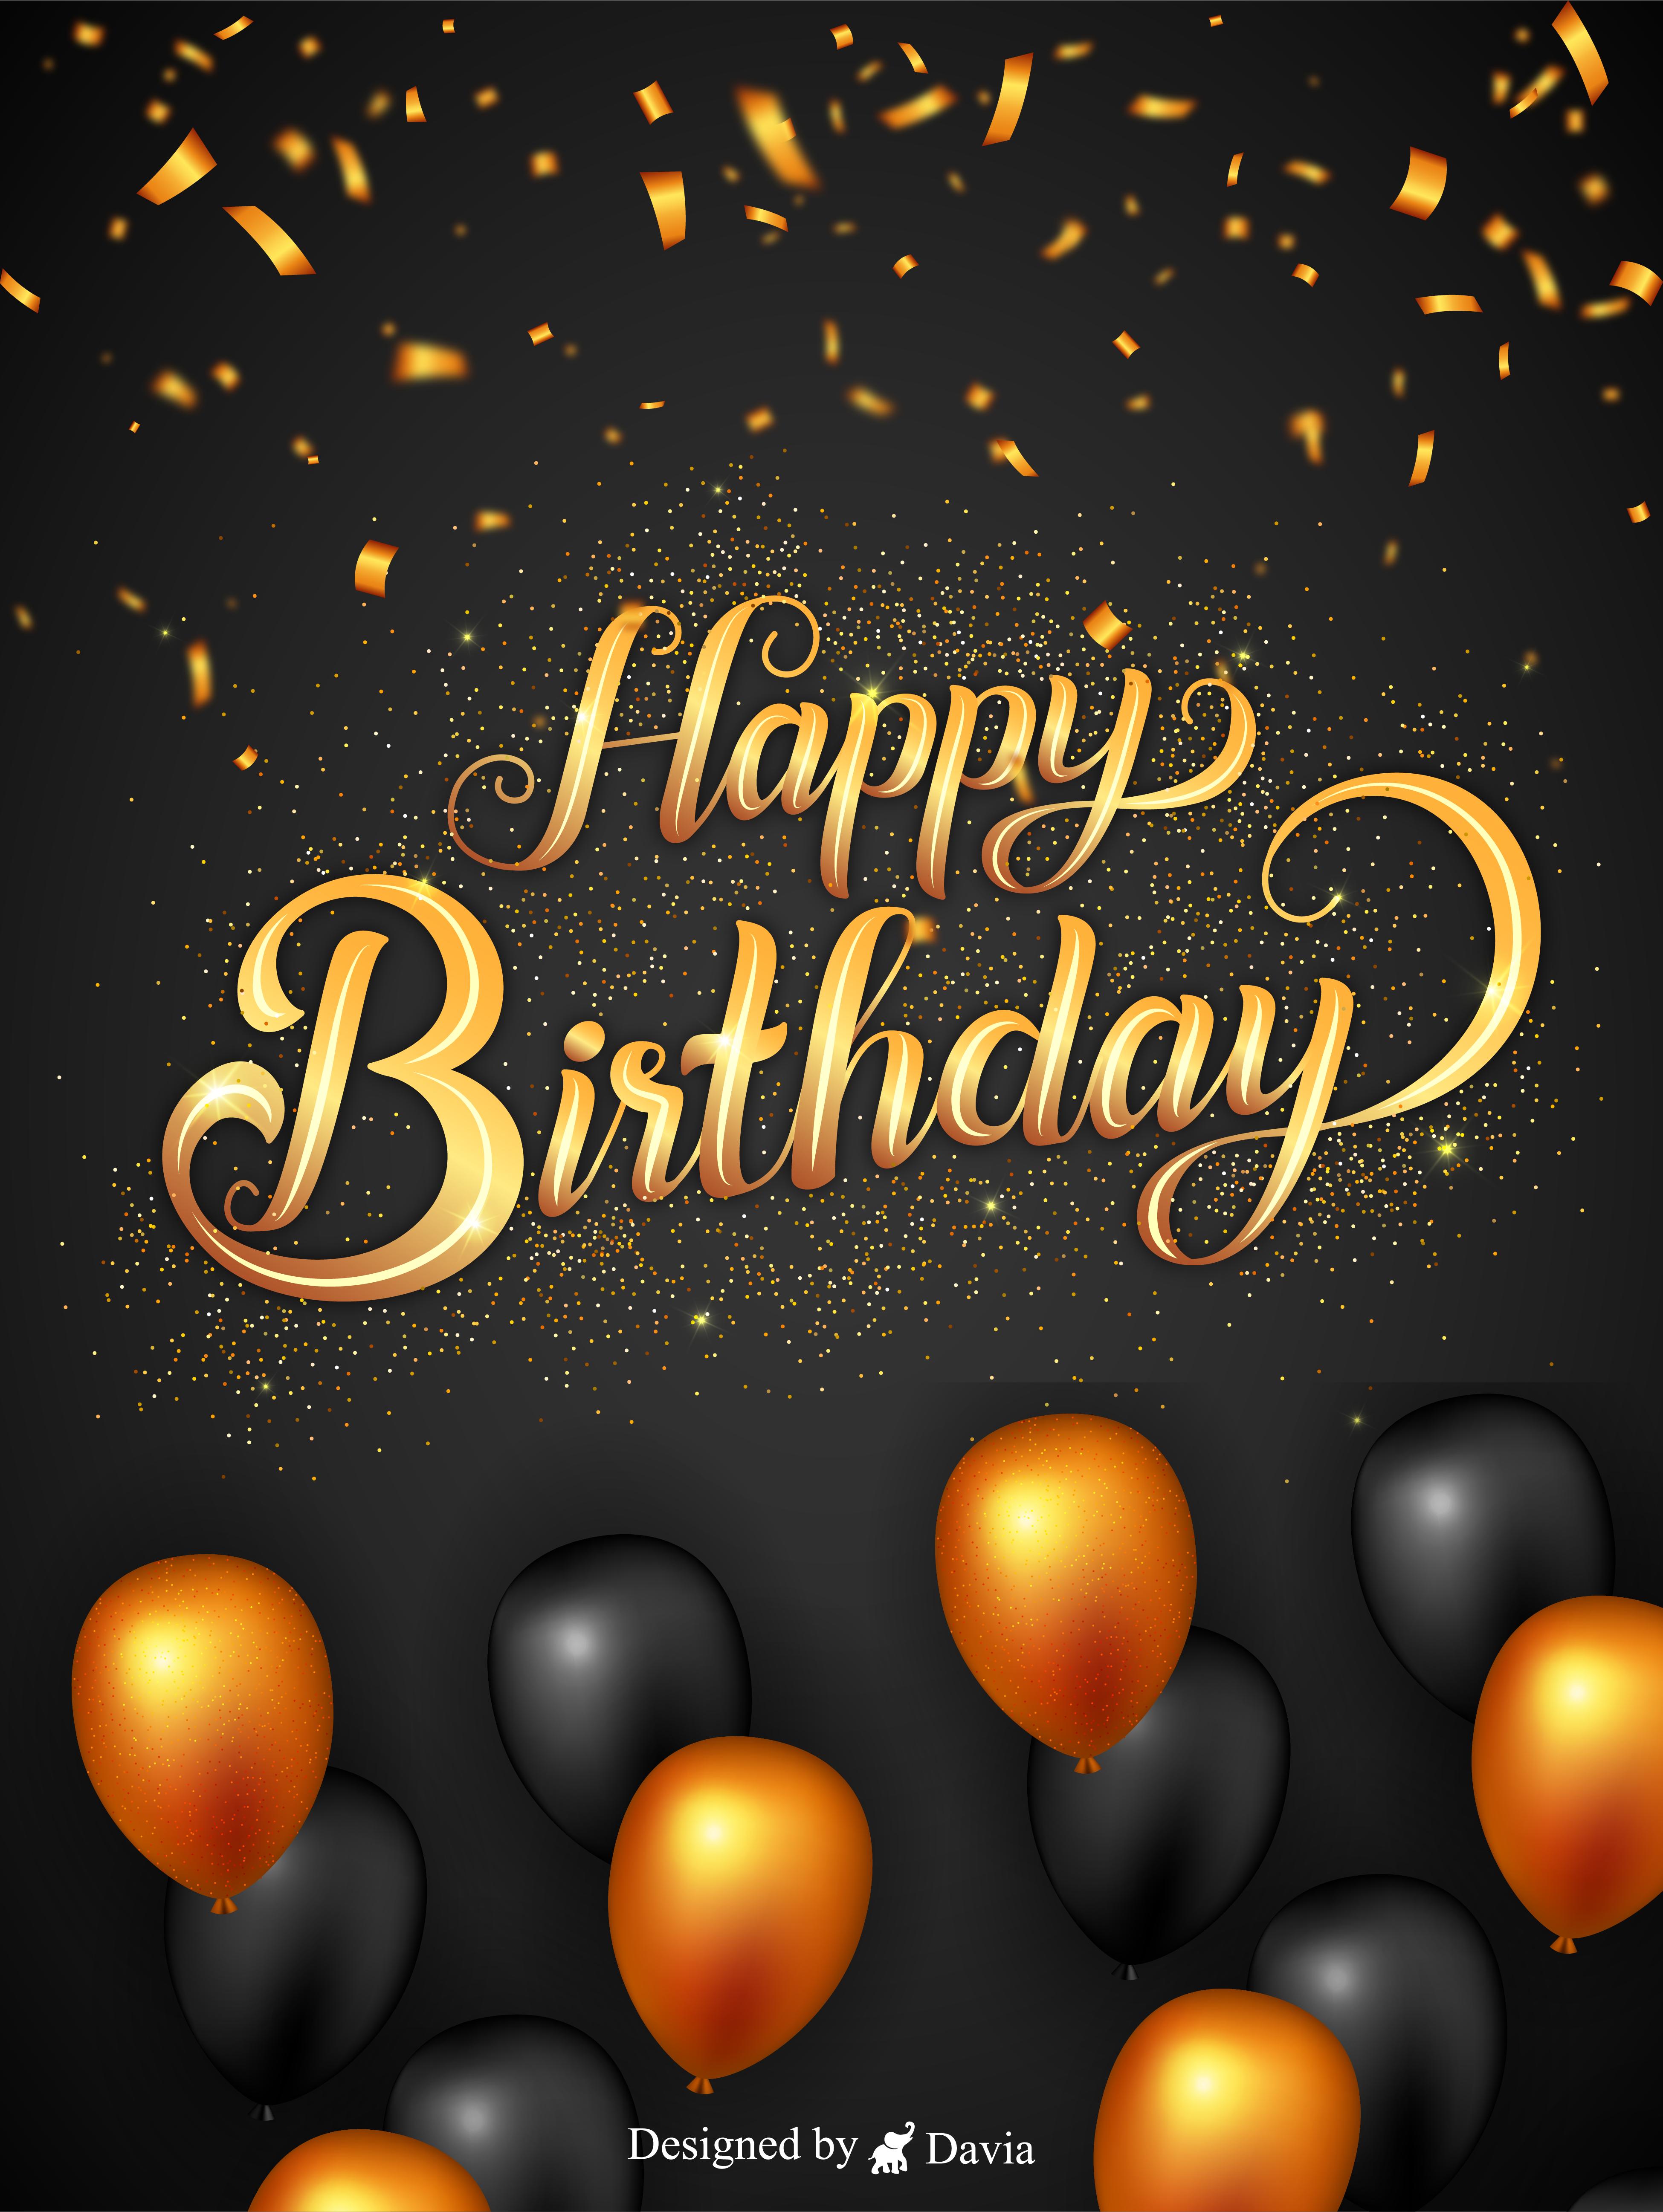 100 Best Birthday Cards For Him Ideas In 2021 Birthday Cards For Him Birthday Greeting Cards Birthday Cards